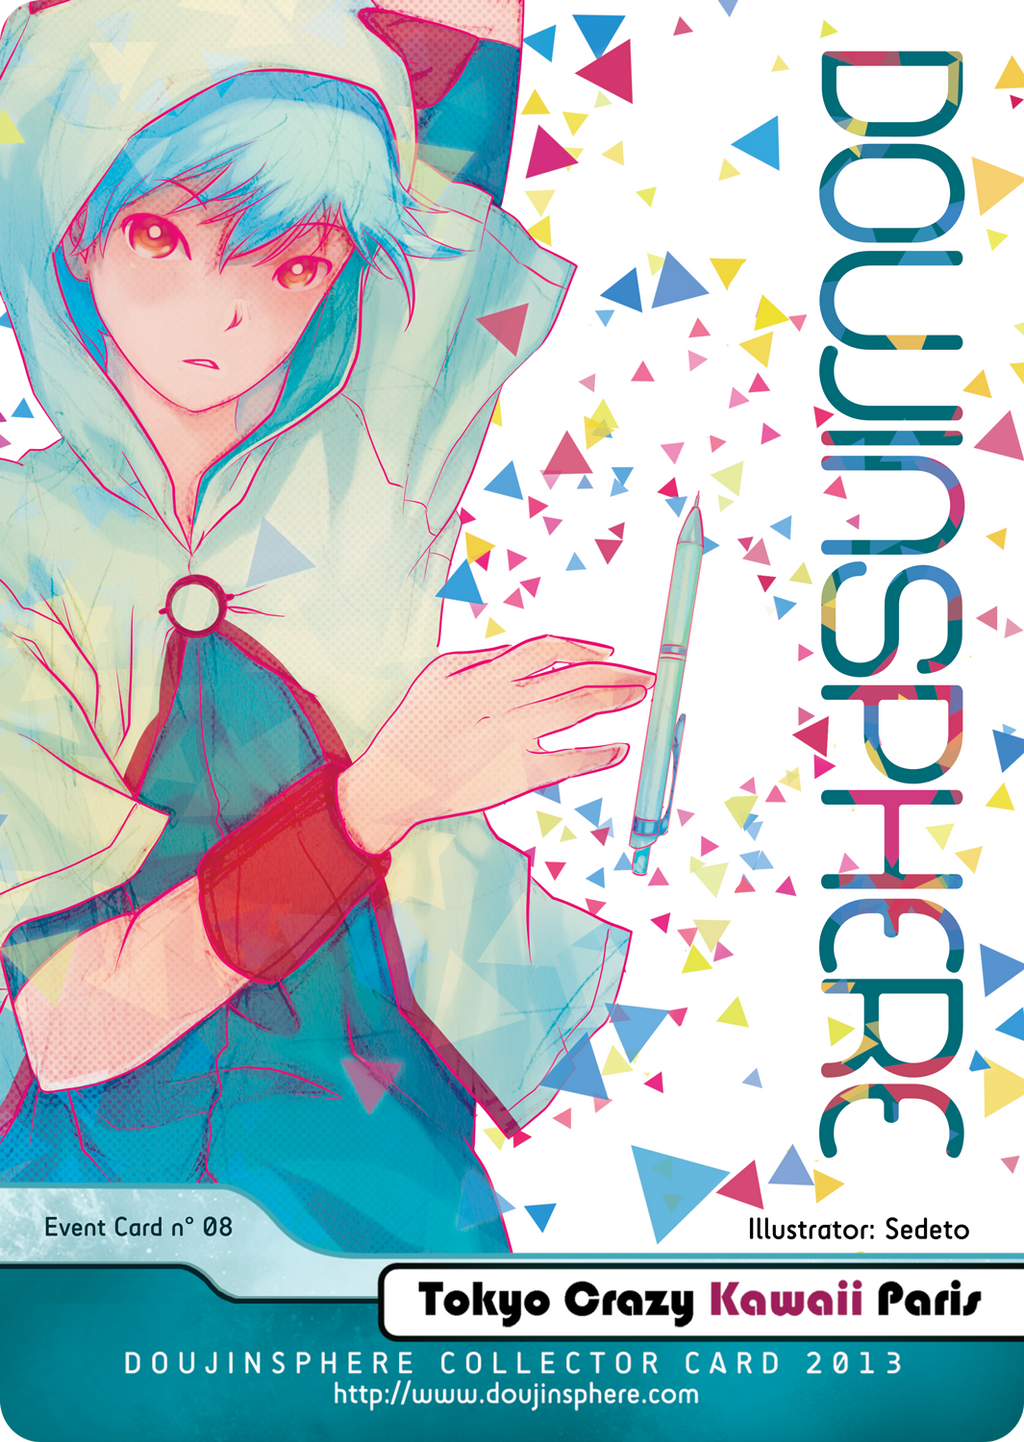 DoujinSphere Card by Sedeto